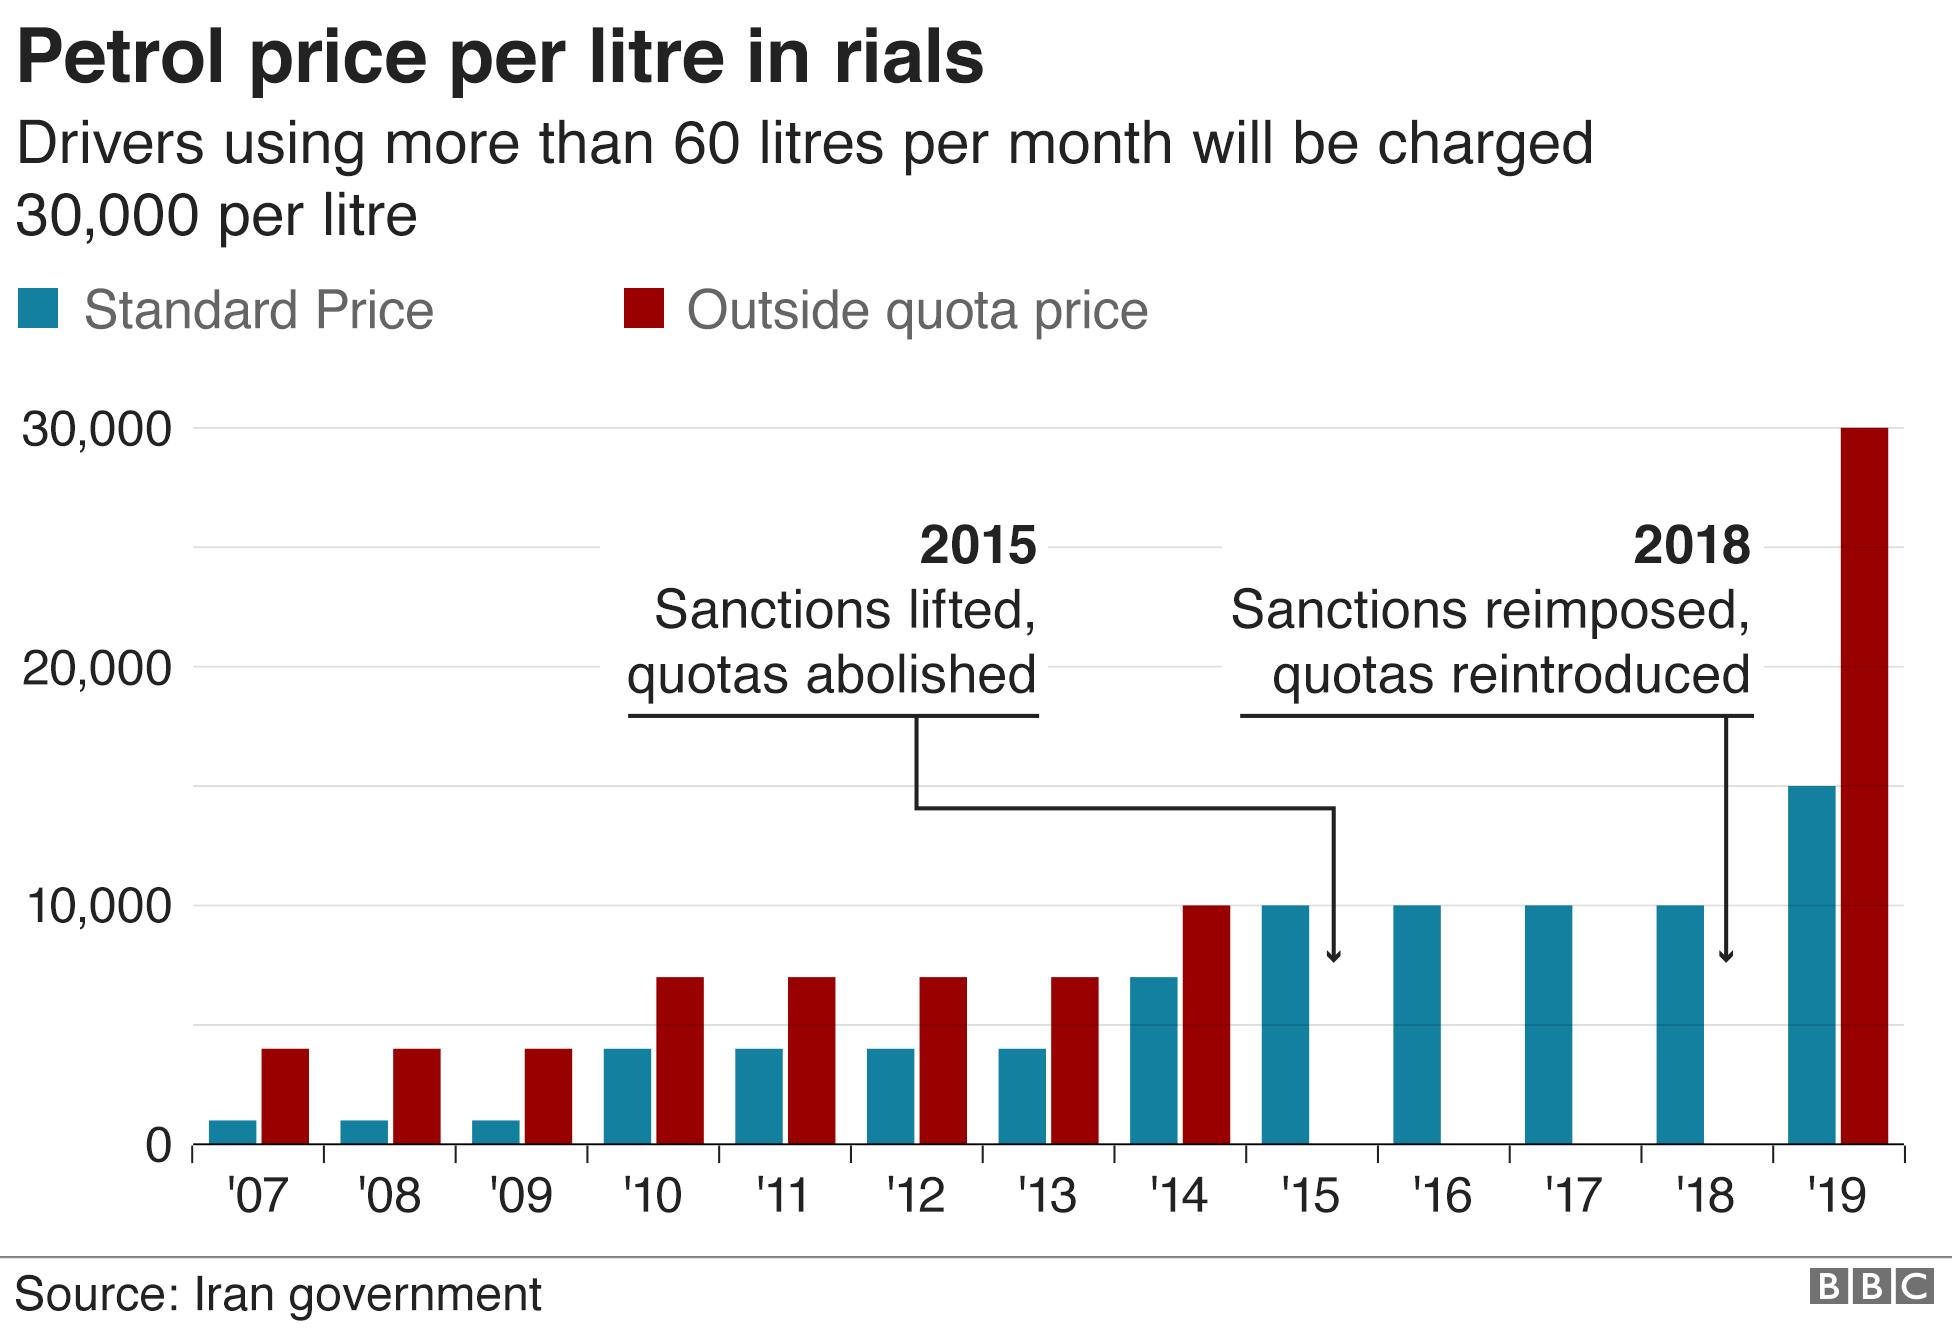 Petrol prices per litre in Iran (November 2019)